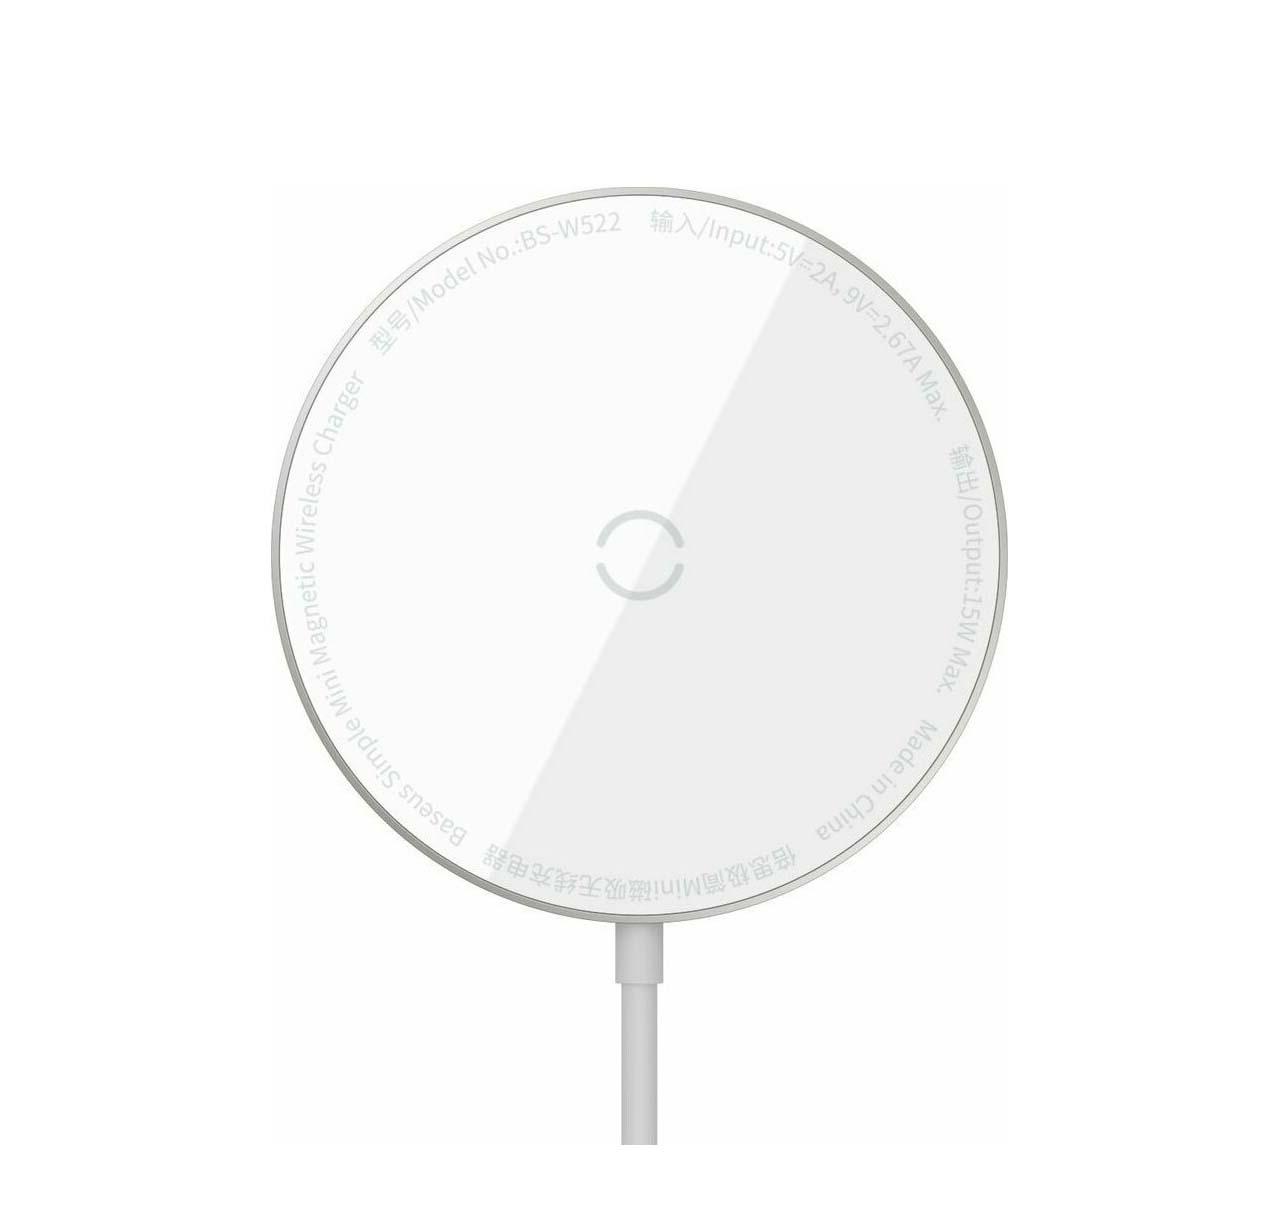 Baseus Wireless charger - Simple Mini Magnetic WXJK-F02 IP12 + Type C 1.5m White